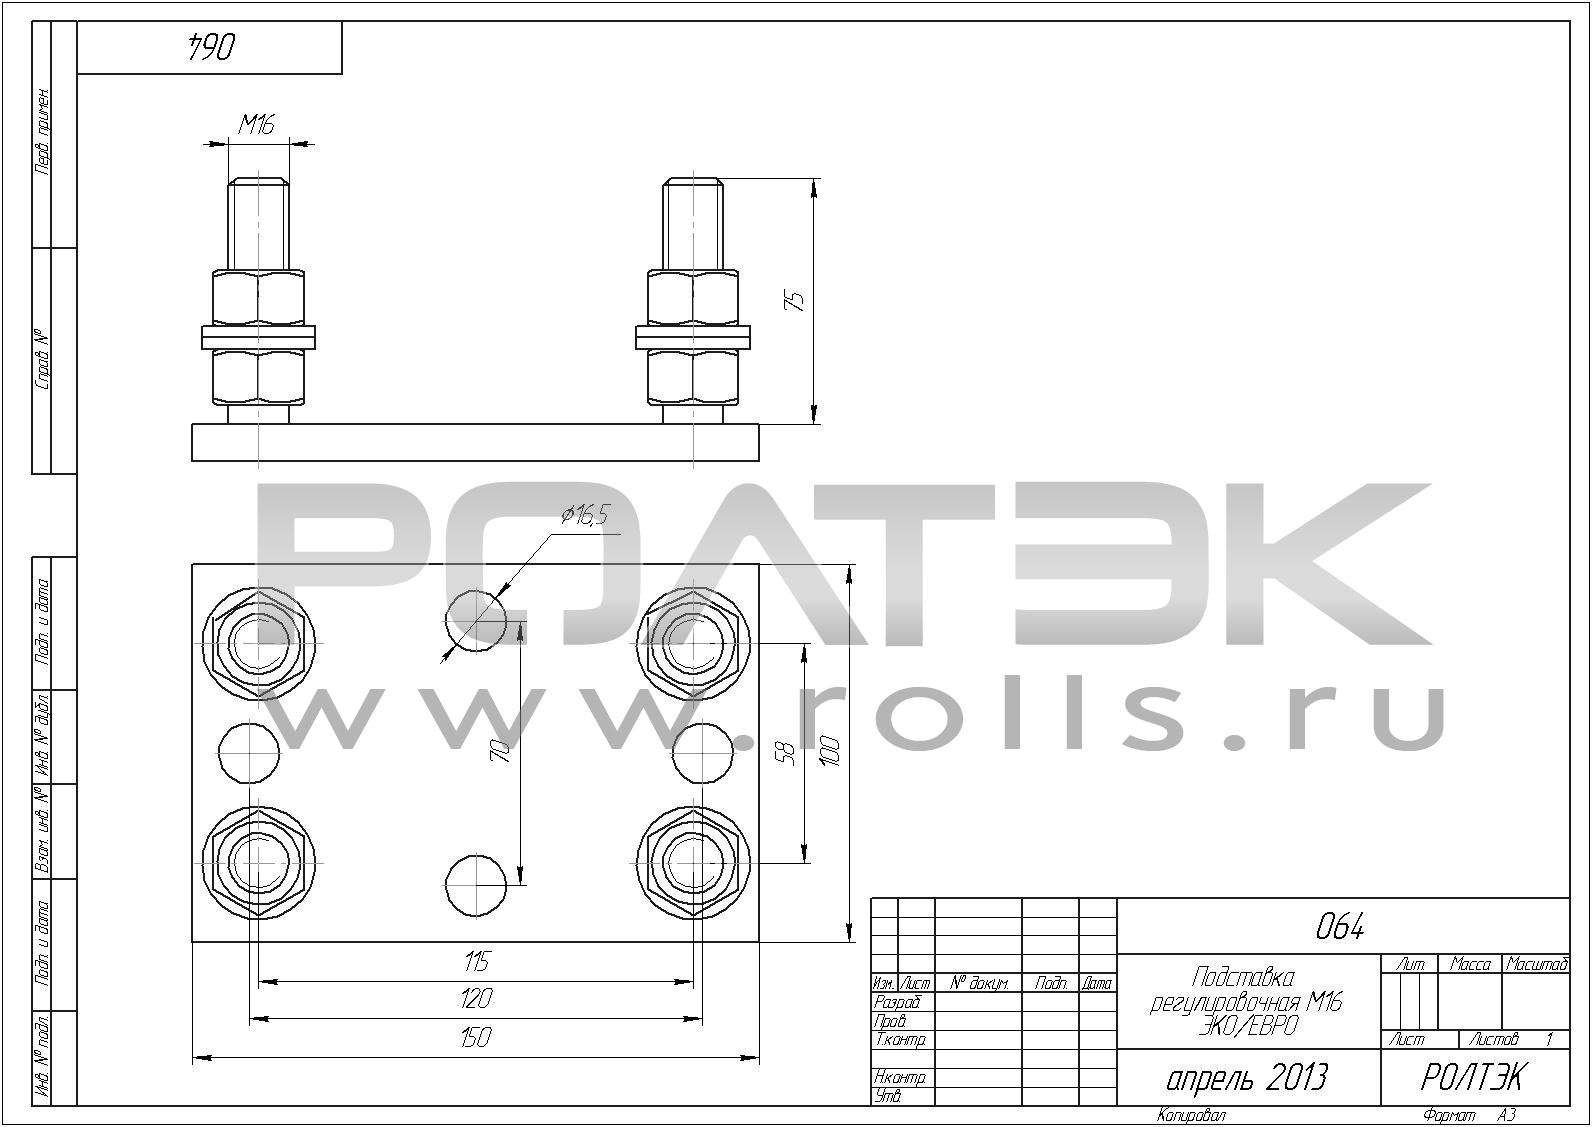 064 Подставка регулировочная М16 ЭКО ЕВРО